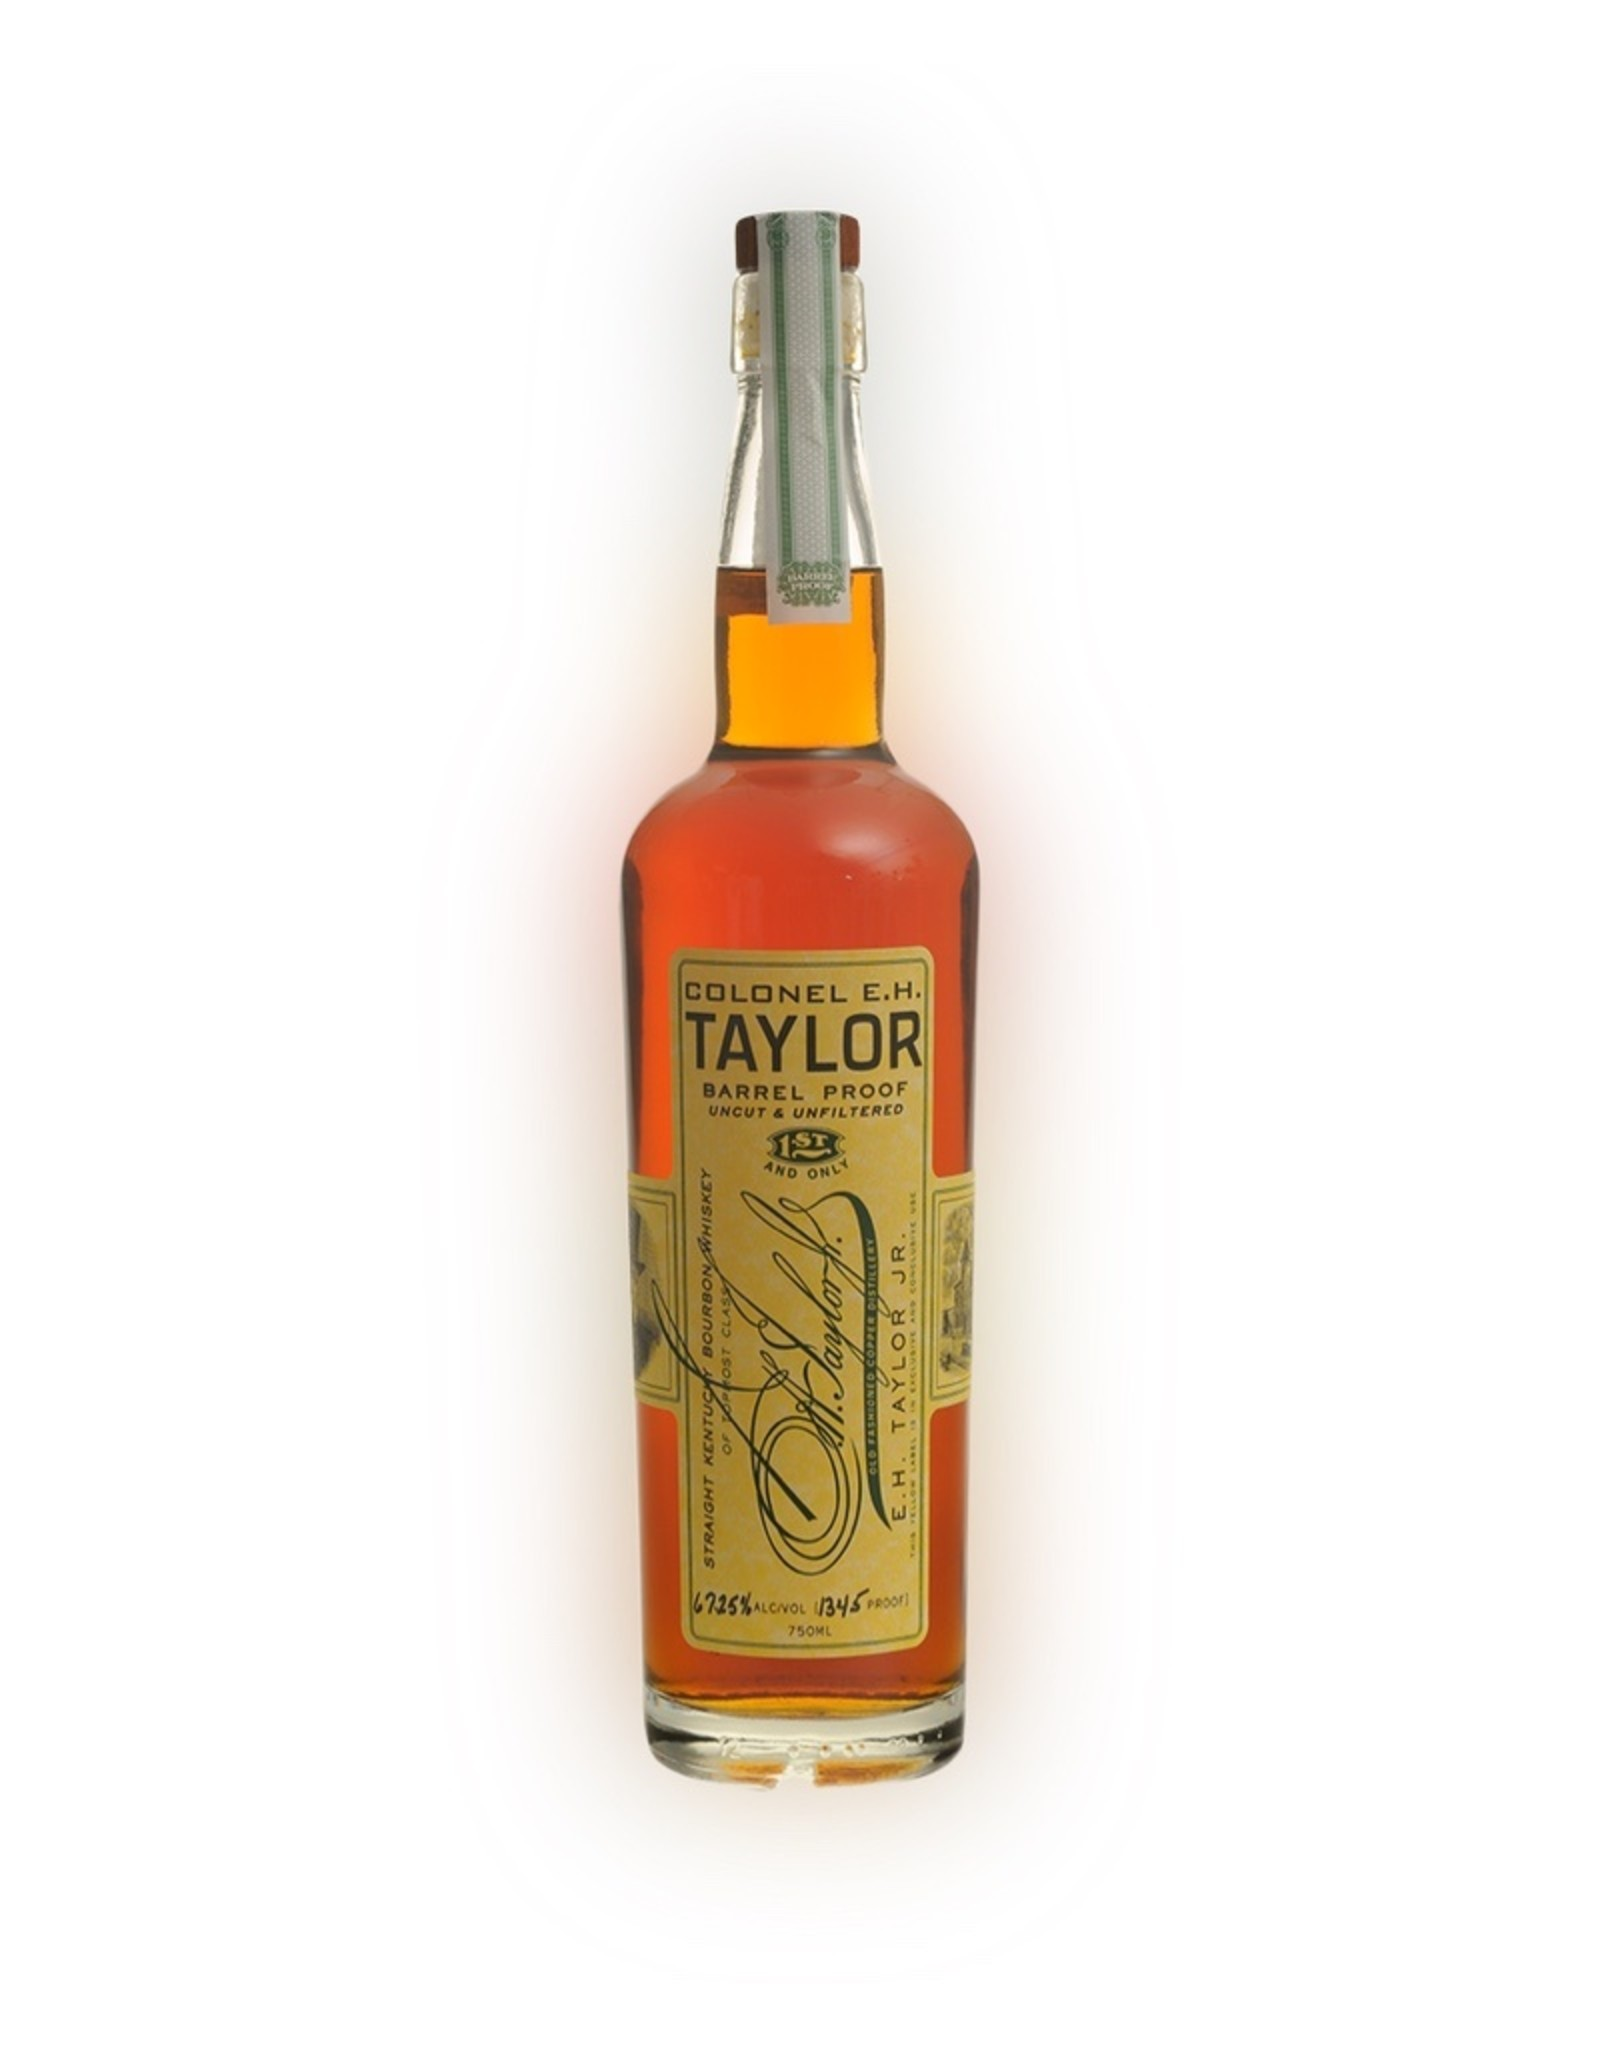 E. H. Taylor Colonel E.H. Taylor BARRELL PROOF UNCUT & UNFILTERED